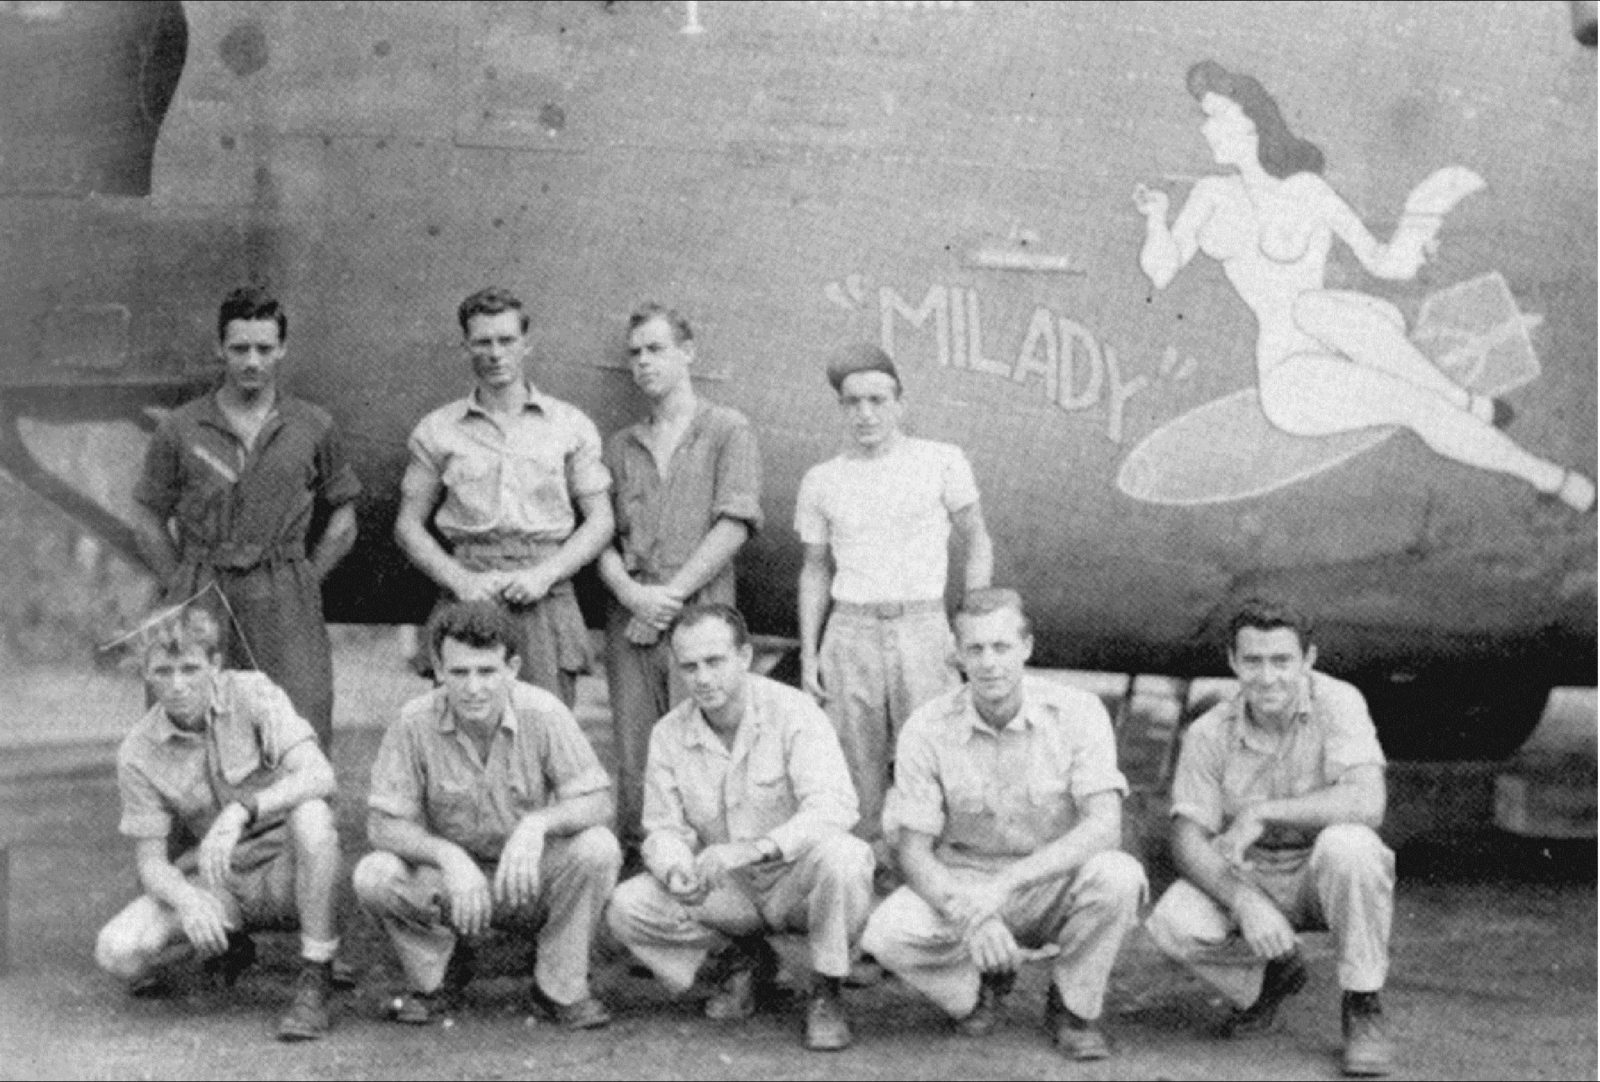 Crew of the B24J Milady